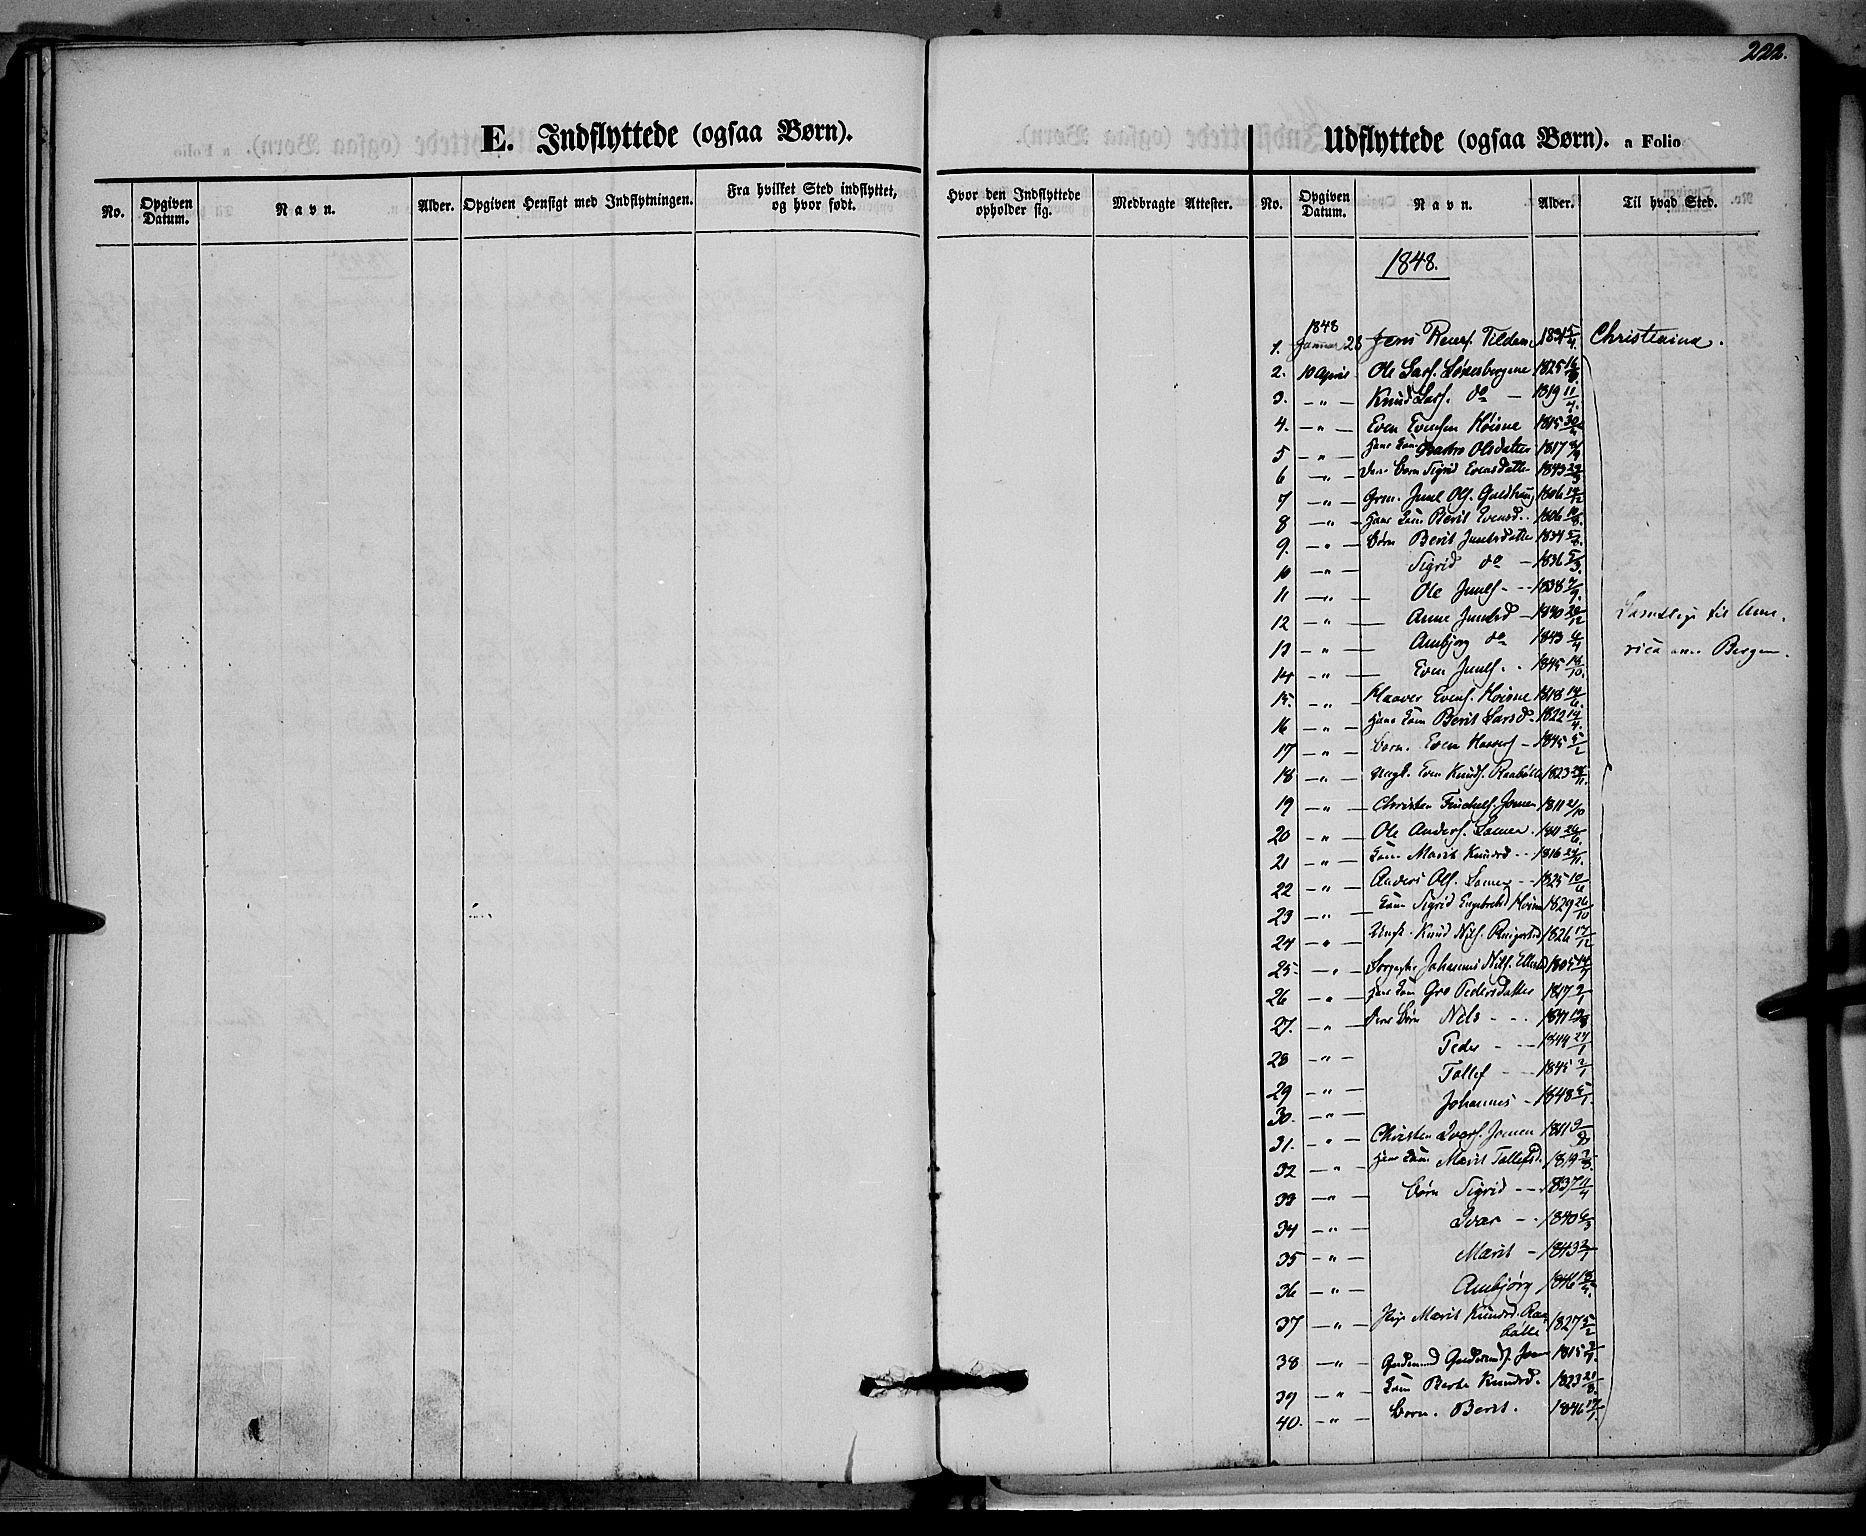 SAH, Vestre Slidre prestekontor, Ministerialbok nr. 1, 1844-1855, s. 222